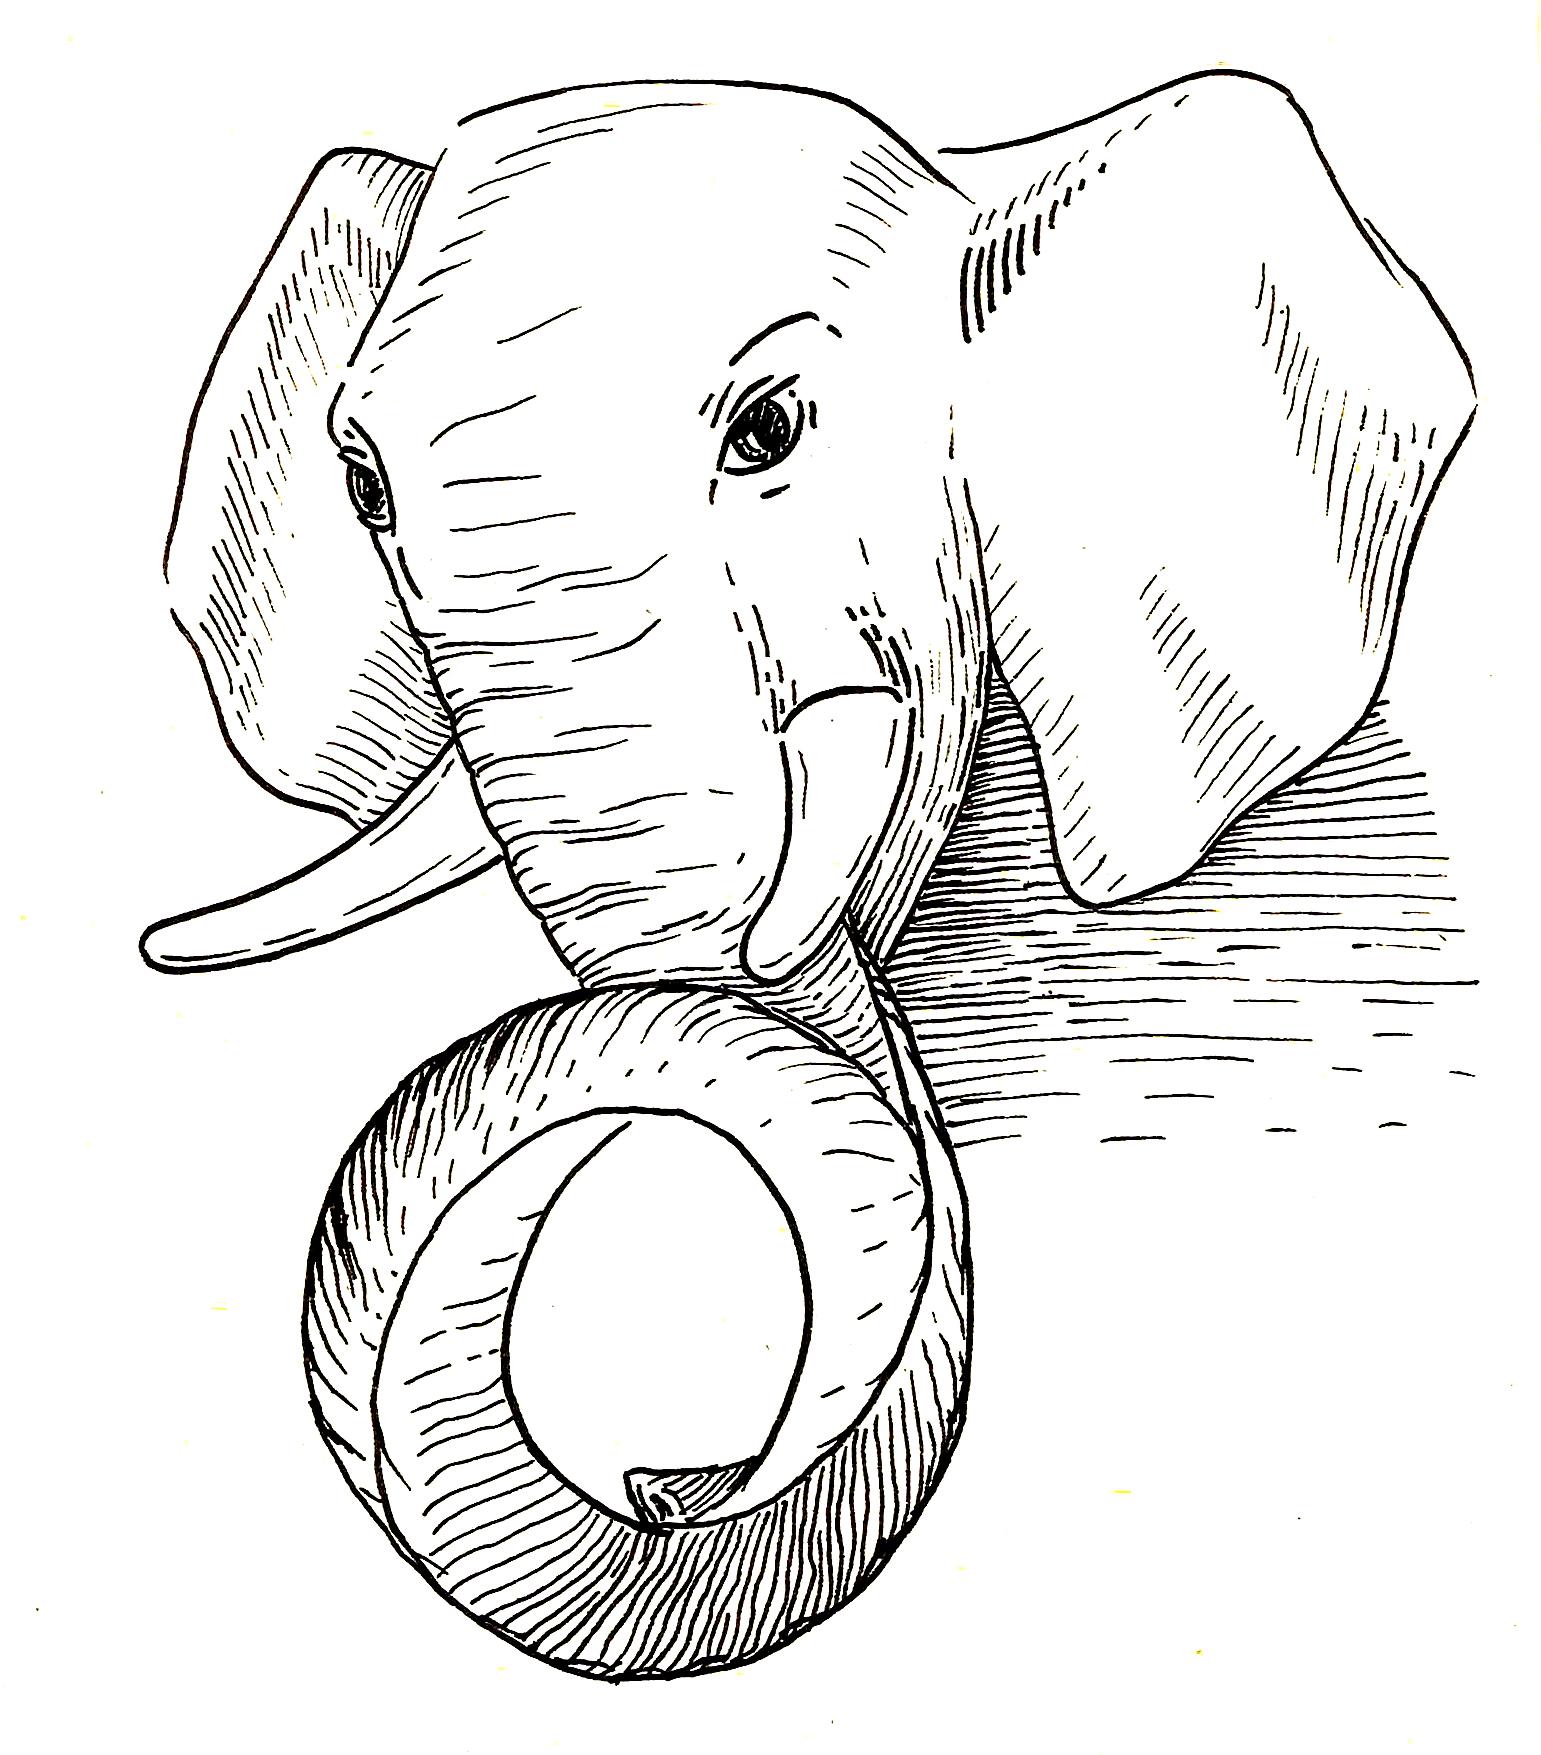 slon_1.jpg